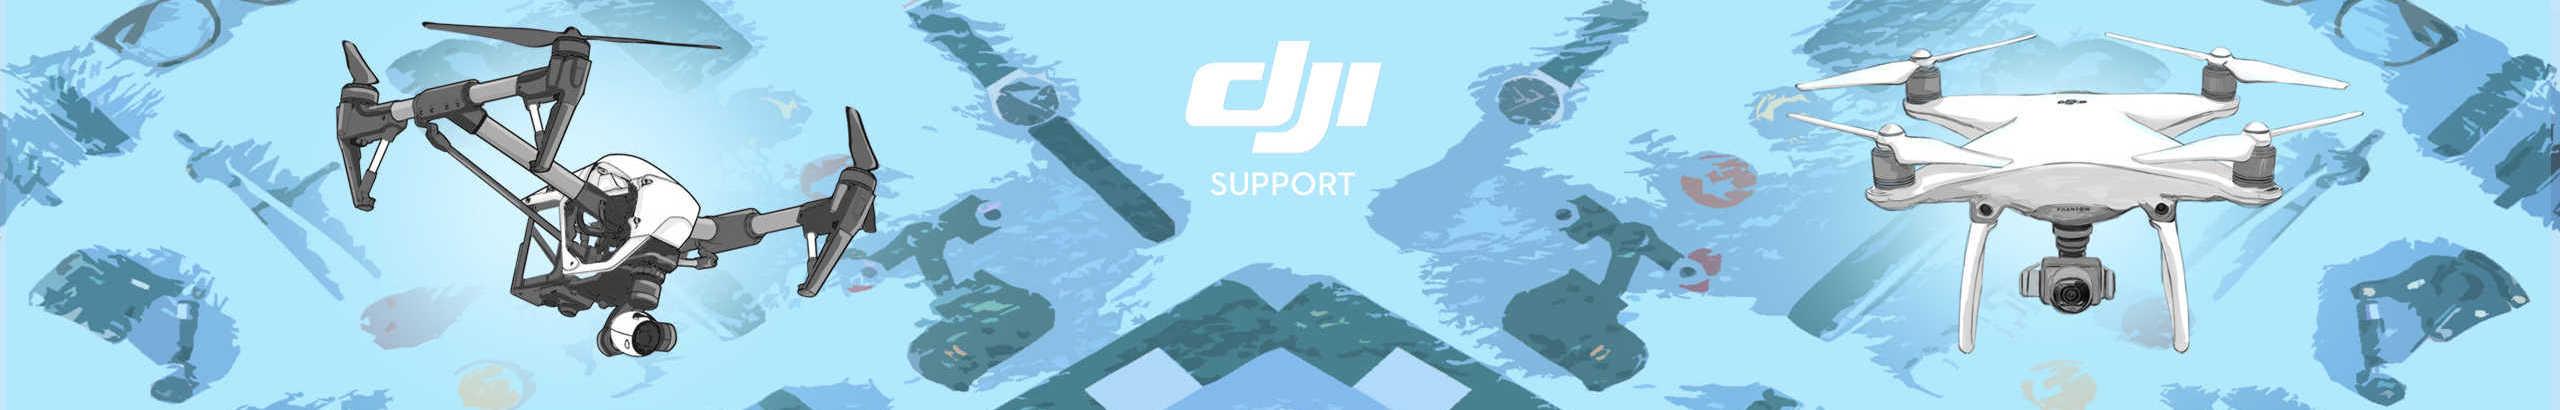 DJI_SUPPORT banner